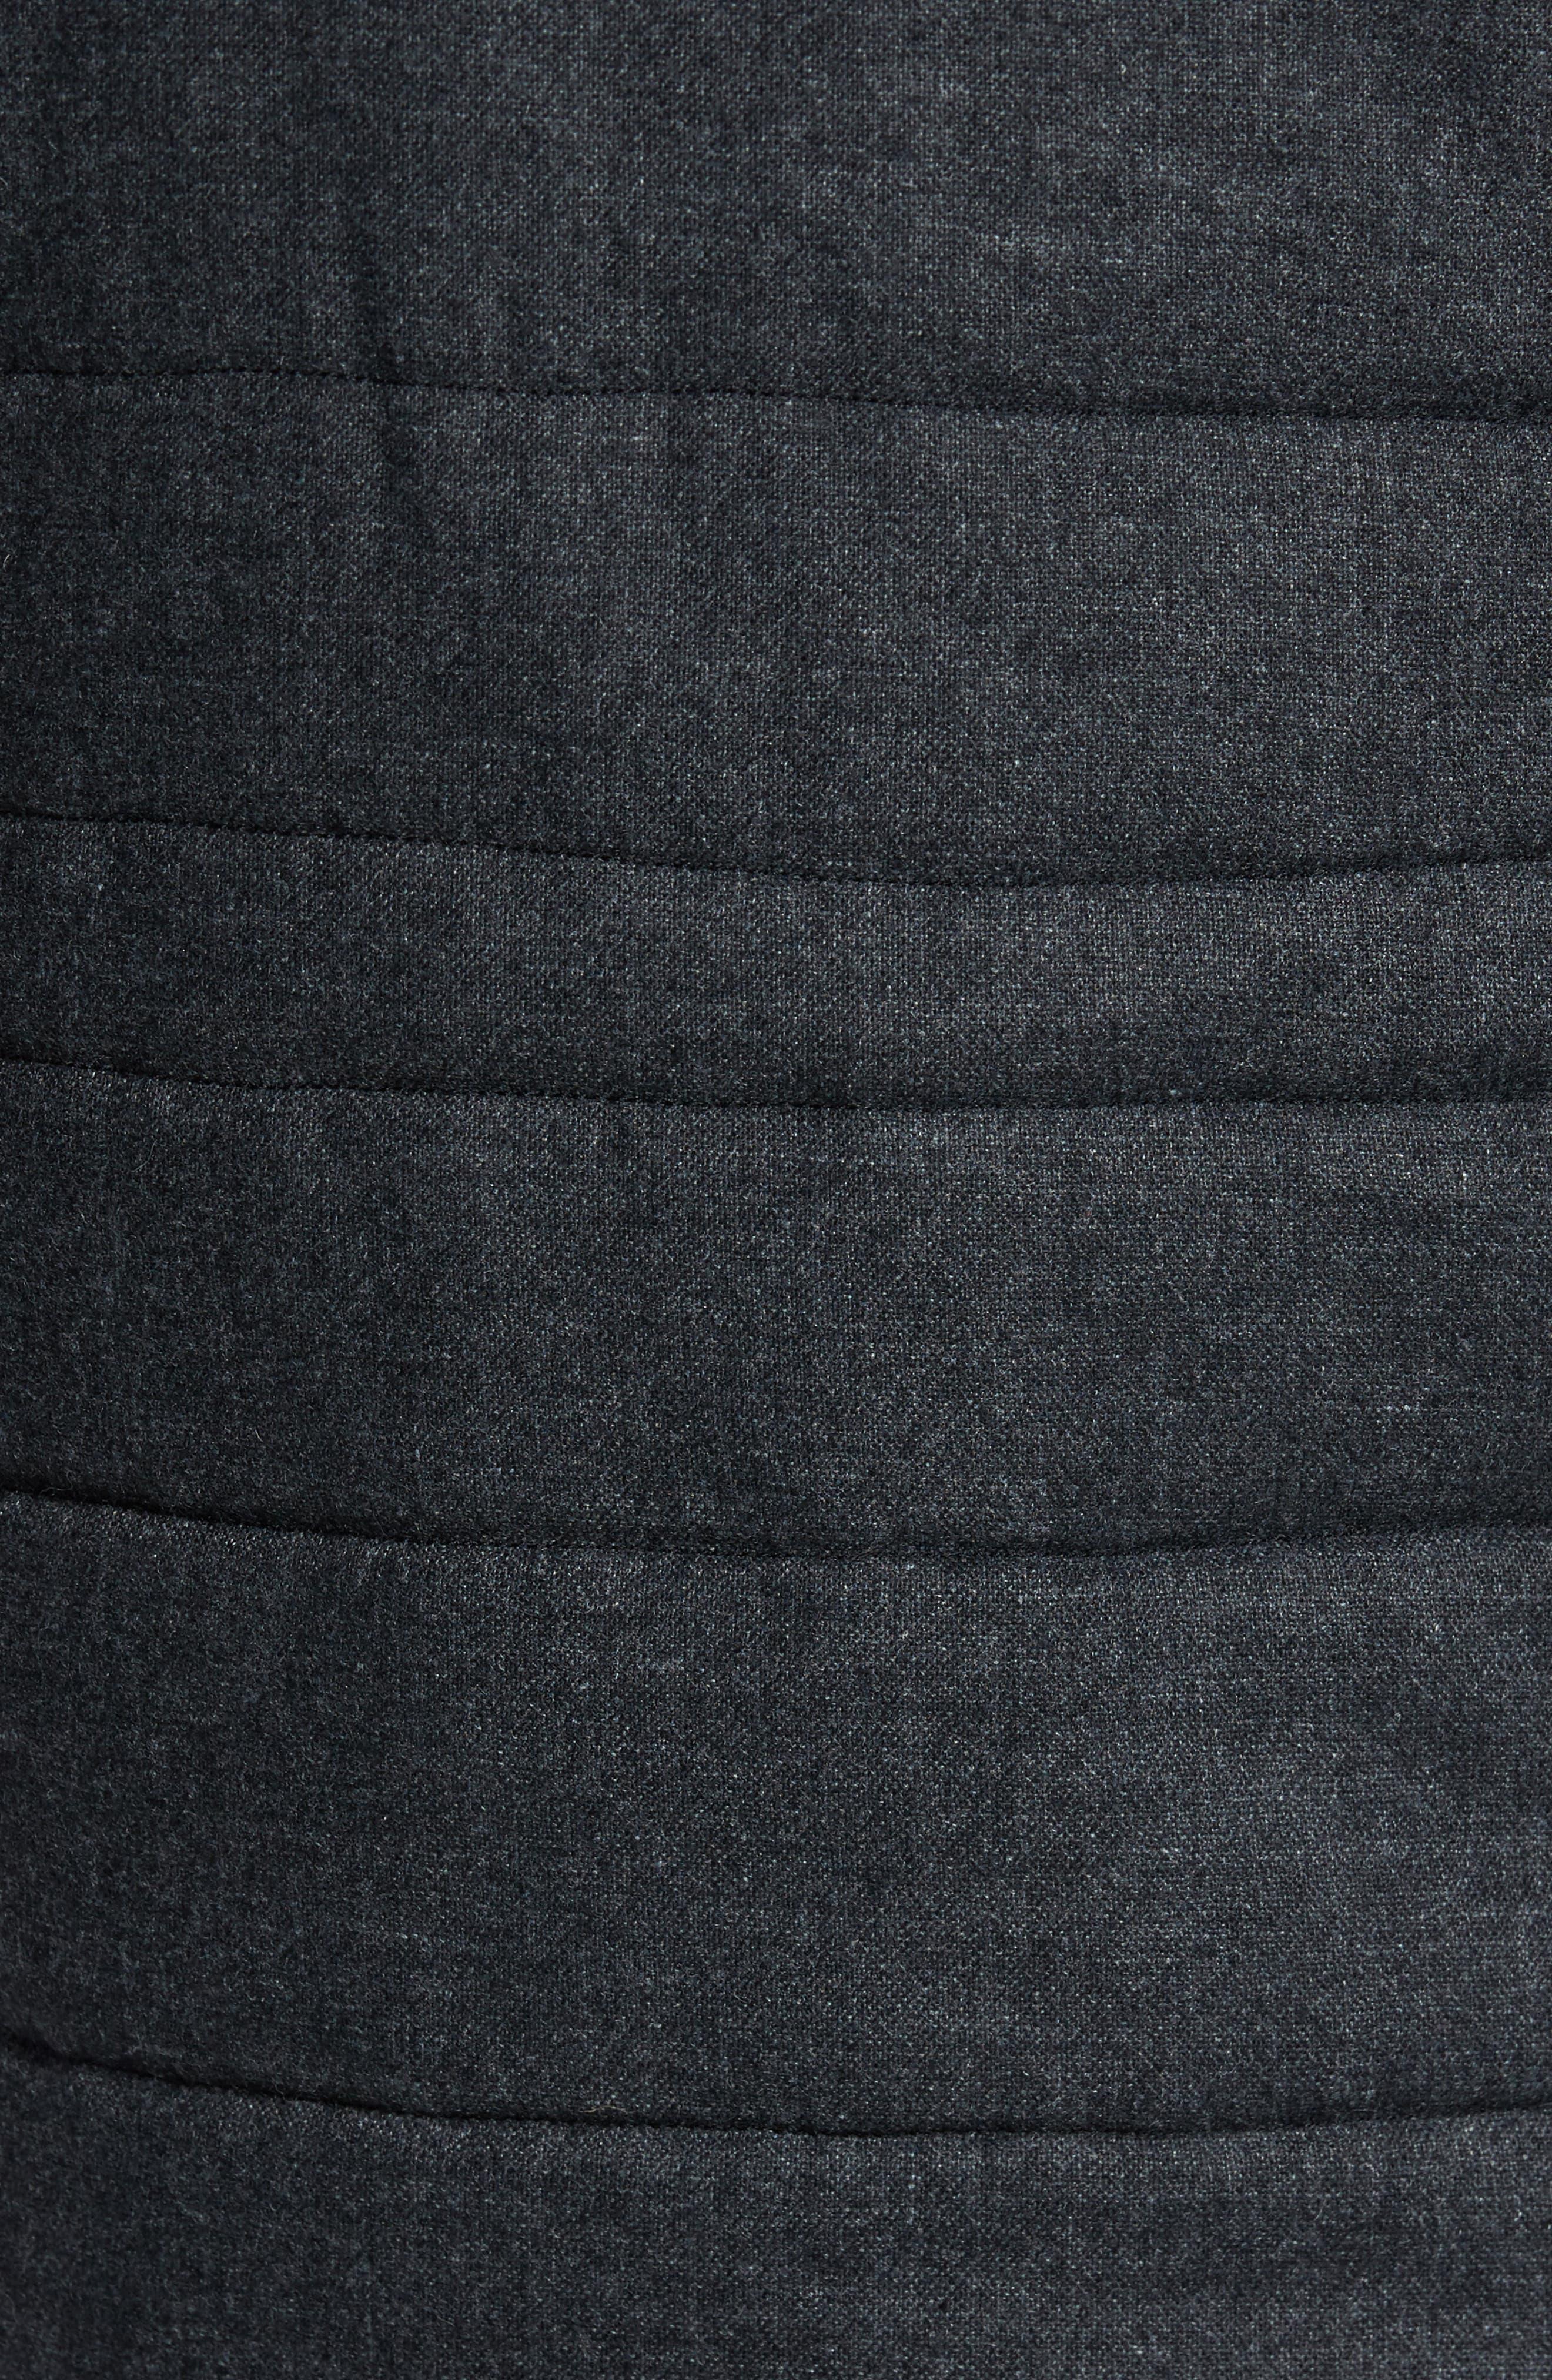 Johnsonville Quilted Vest,                             Alternate thumbnail 6, color,                             021